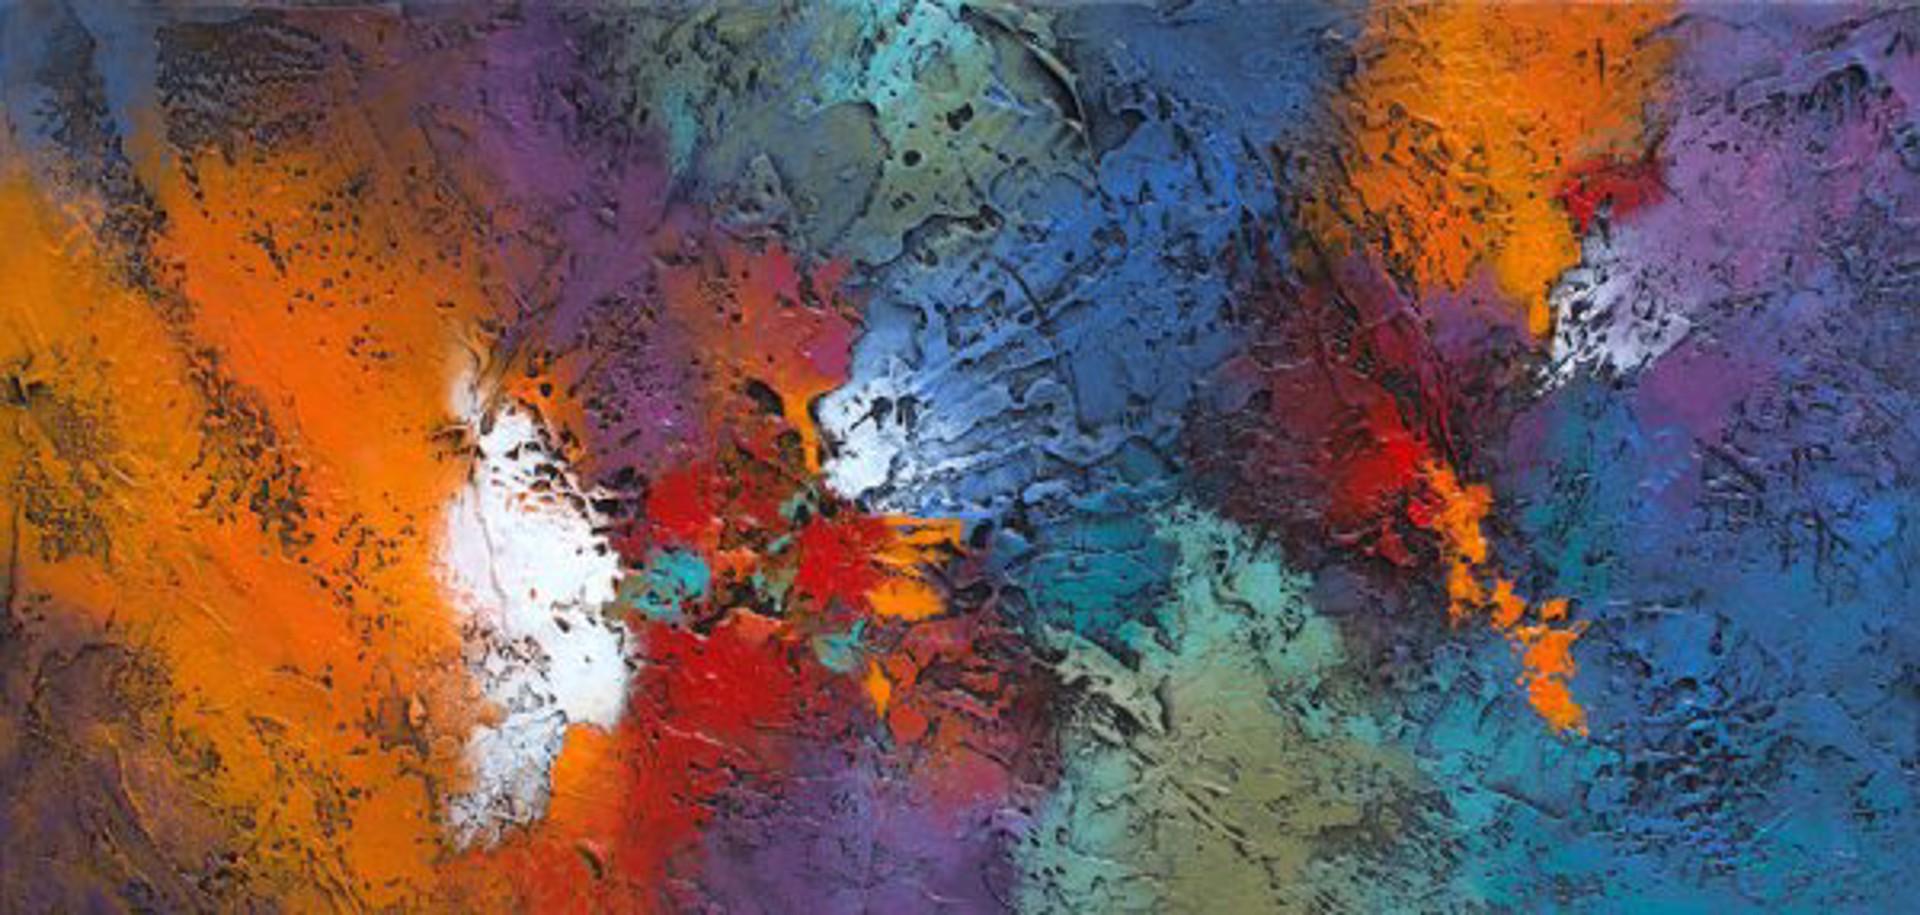 Color Collision by Nancy Eckels